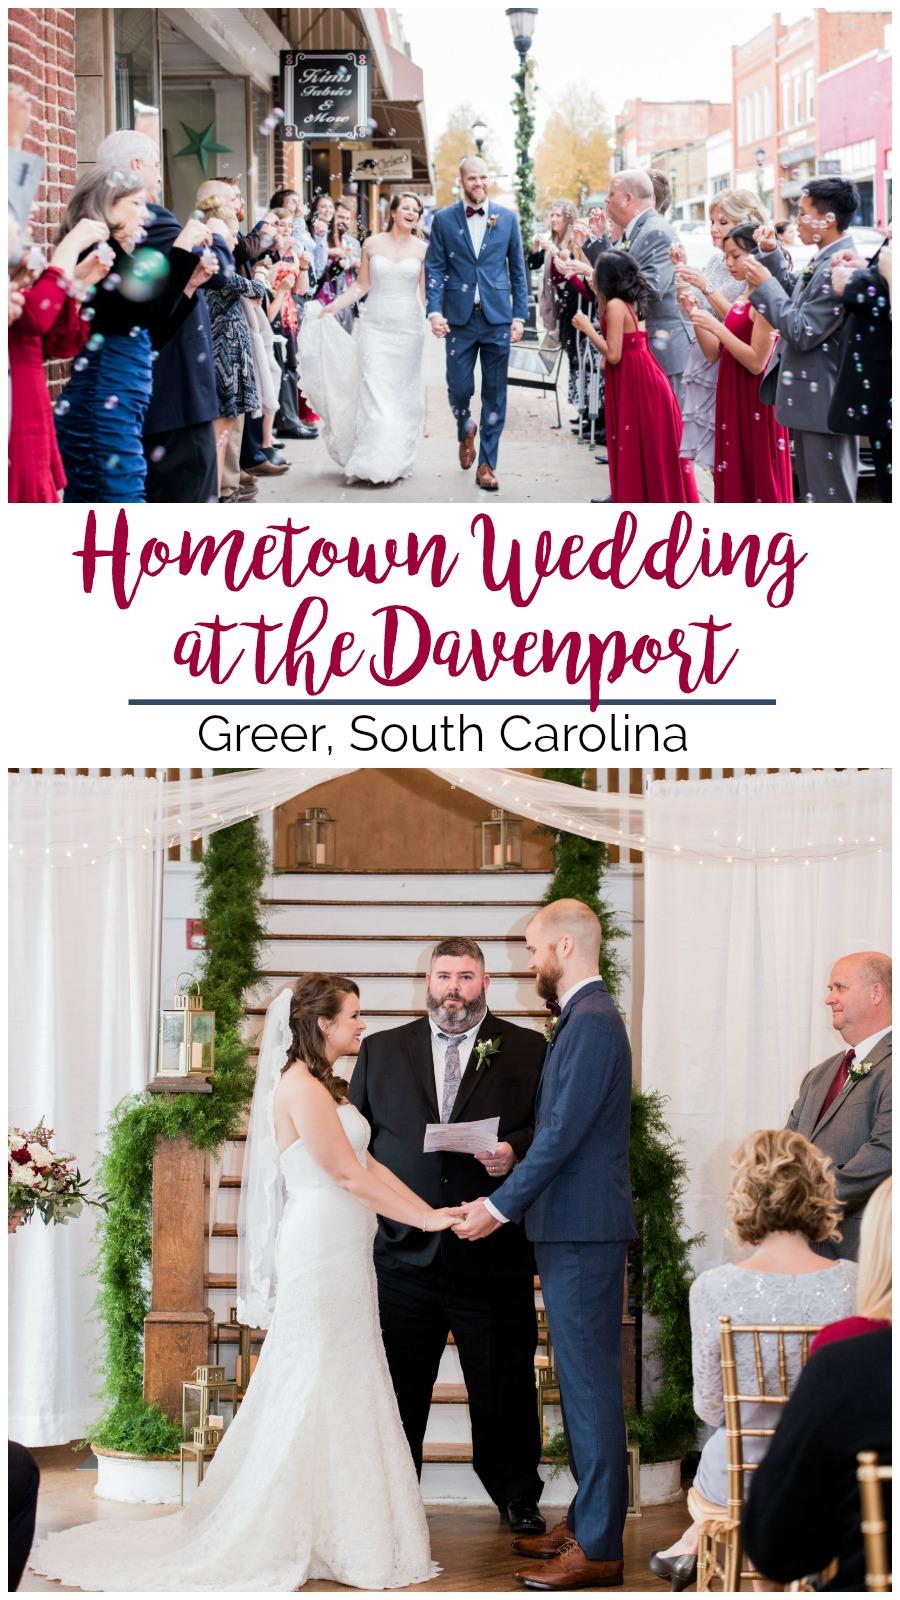 Kasey + Dillon: A Hometown Wedding at the Davenport, Greer, South Carolina   Palmetto State Weddings   Rebecca Hicks Photography